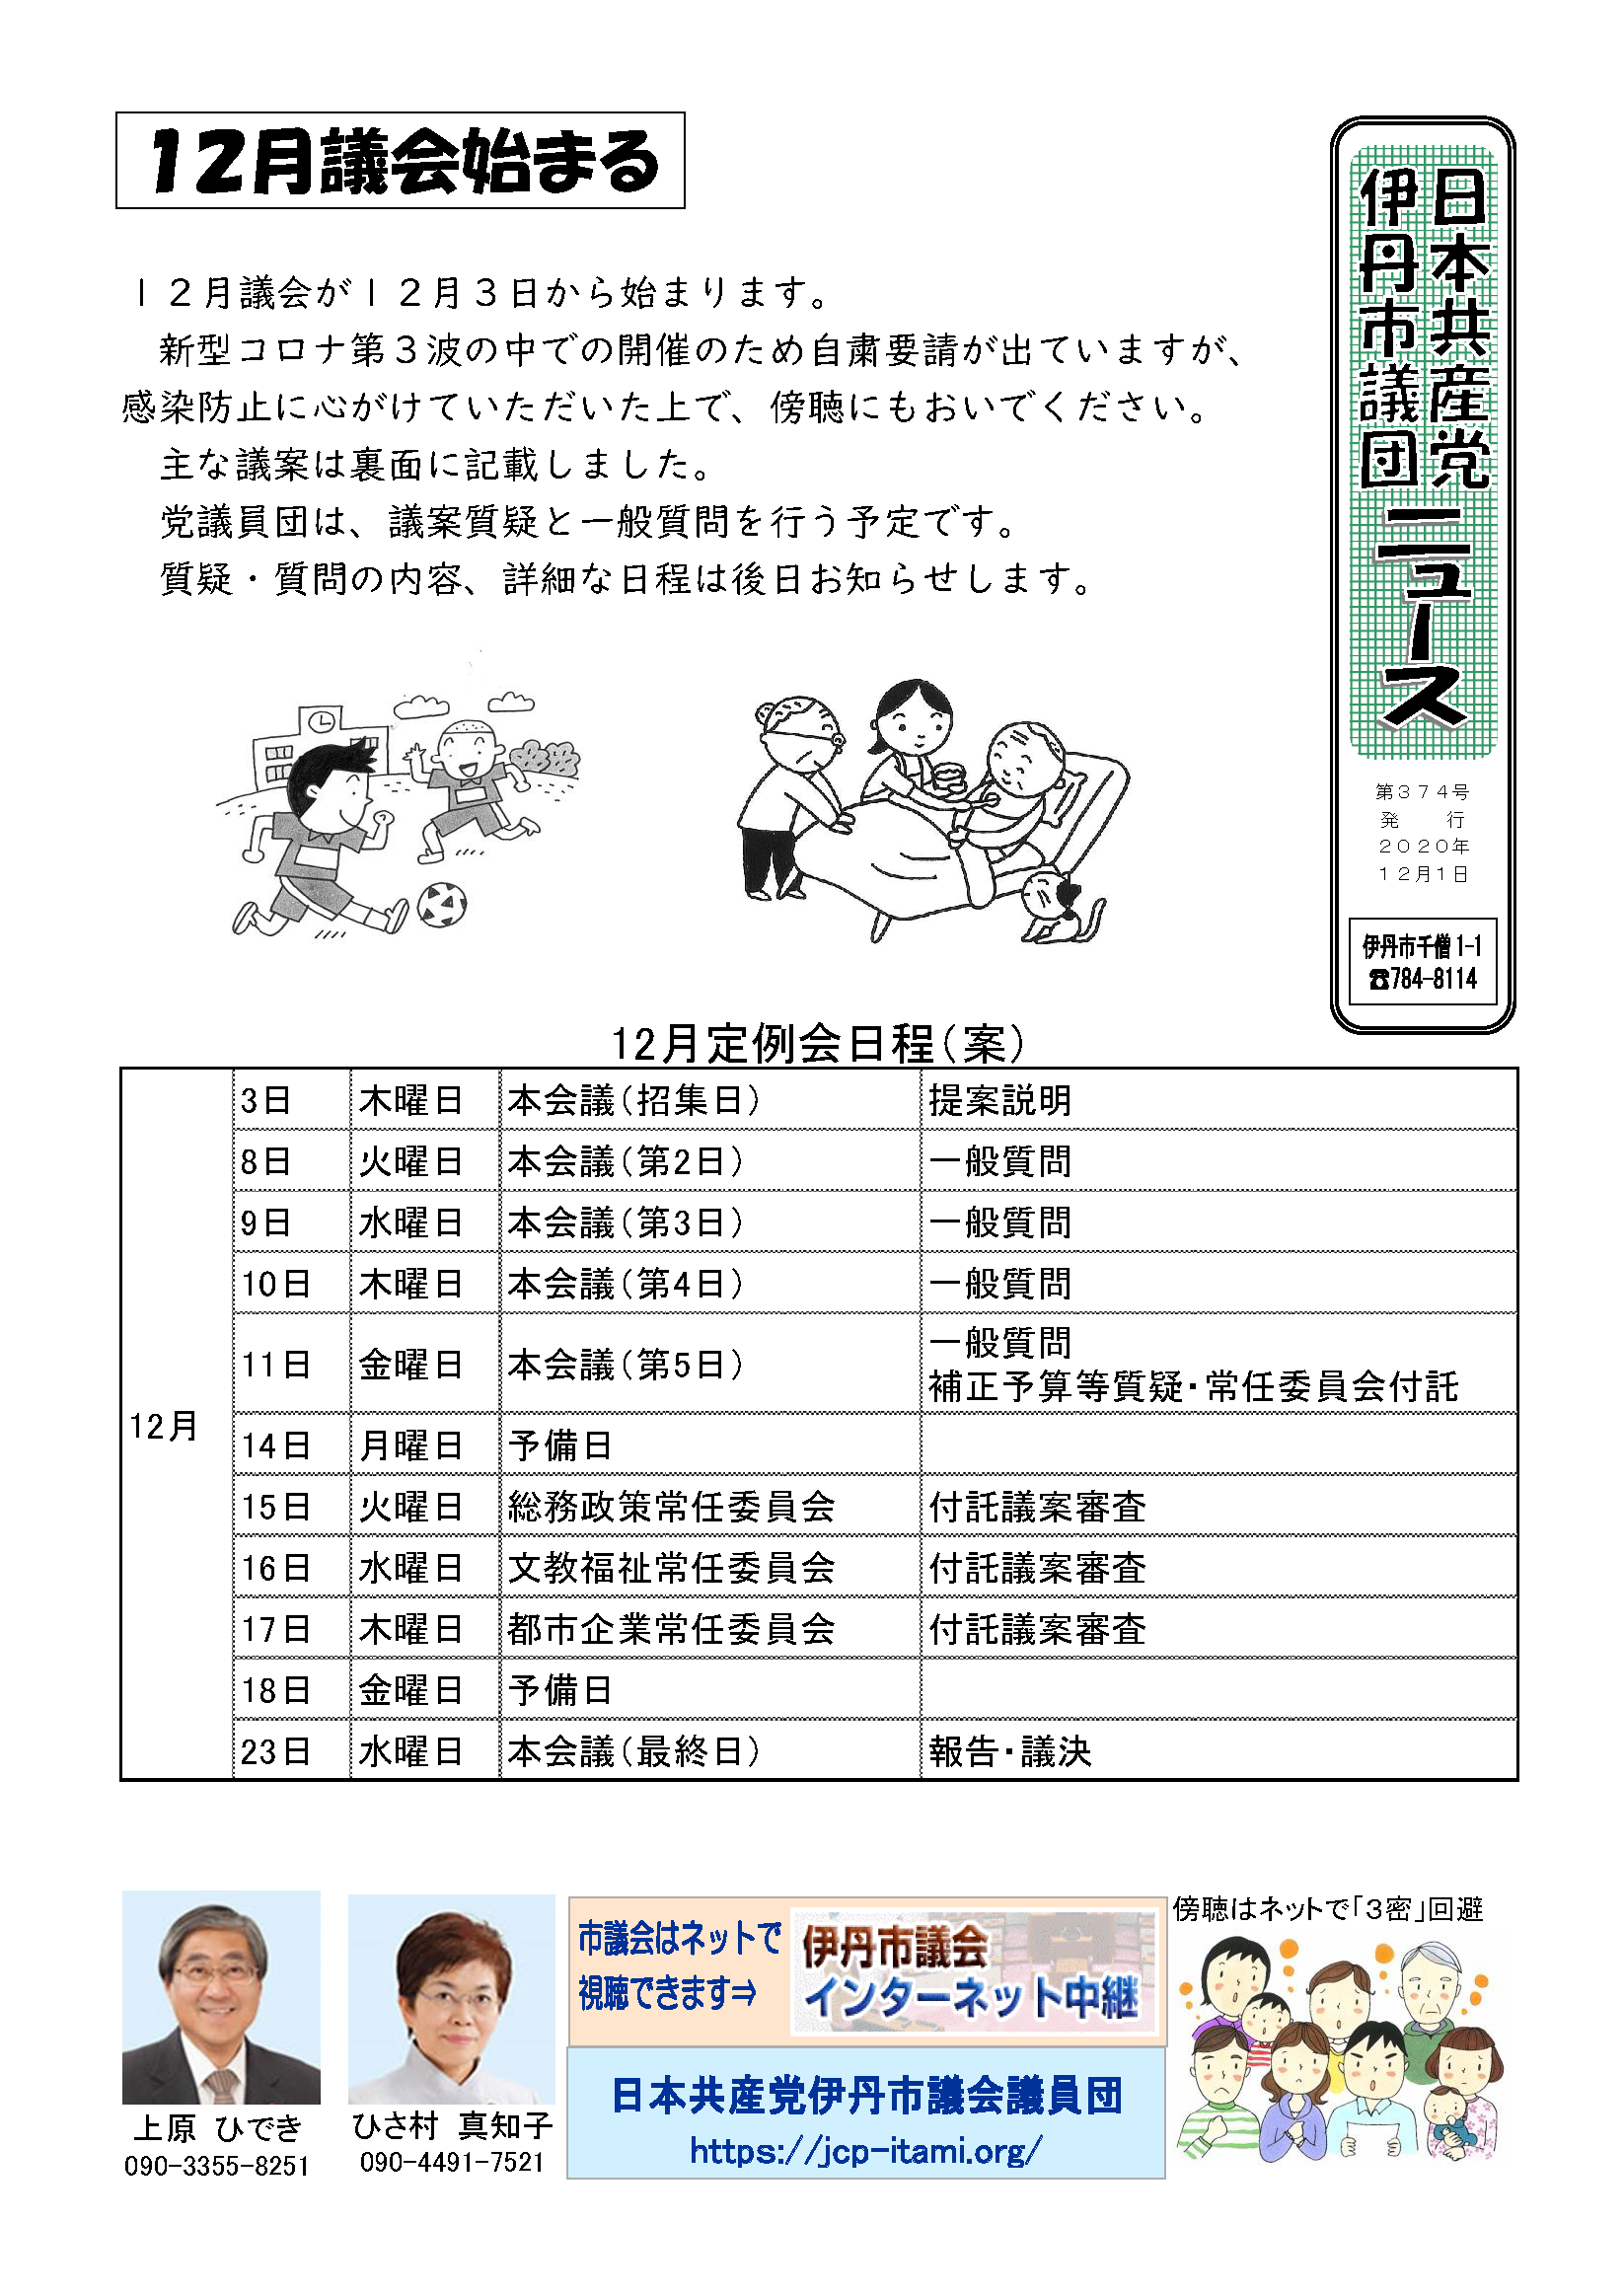 日本共産党伊丹市議団ニュース374号1面